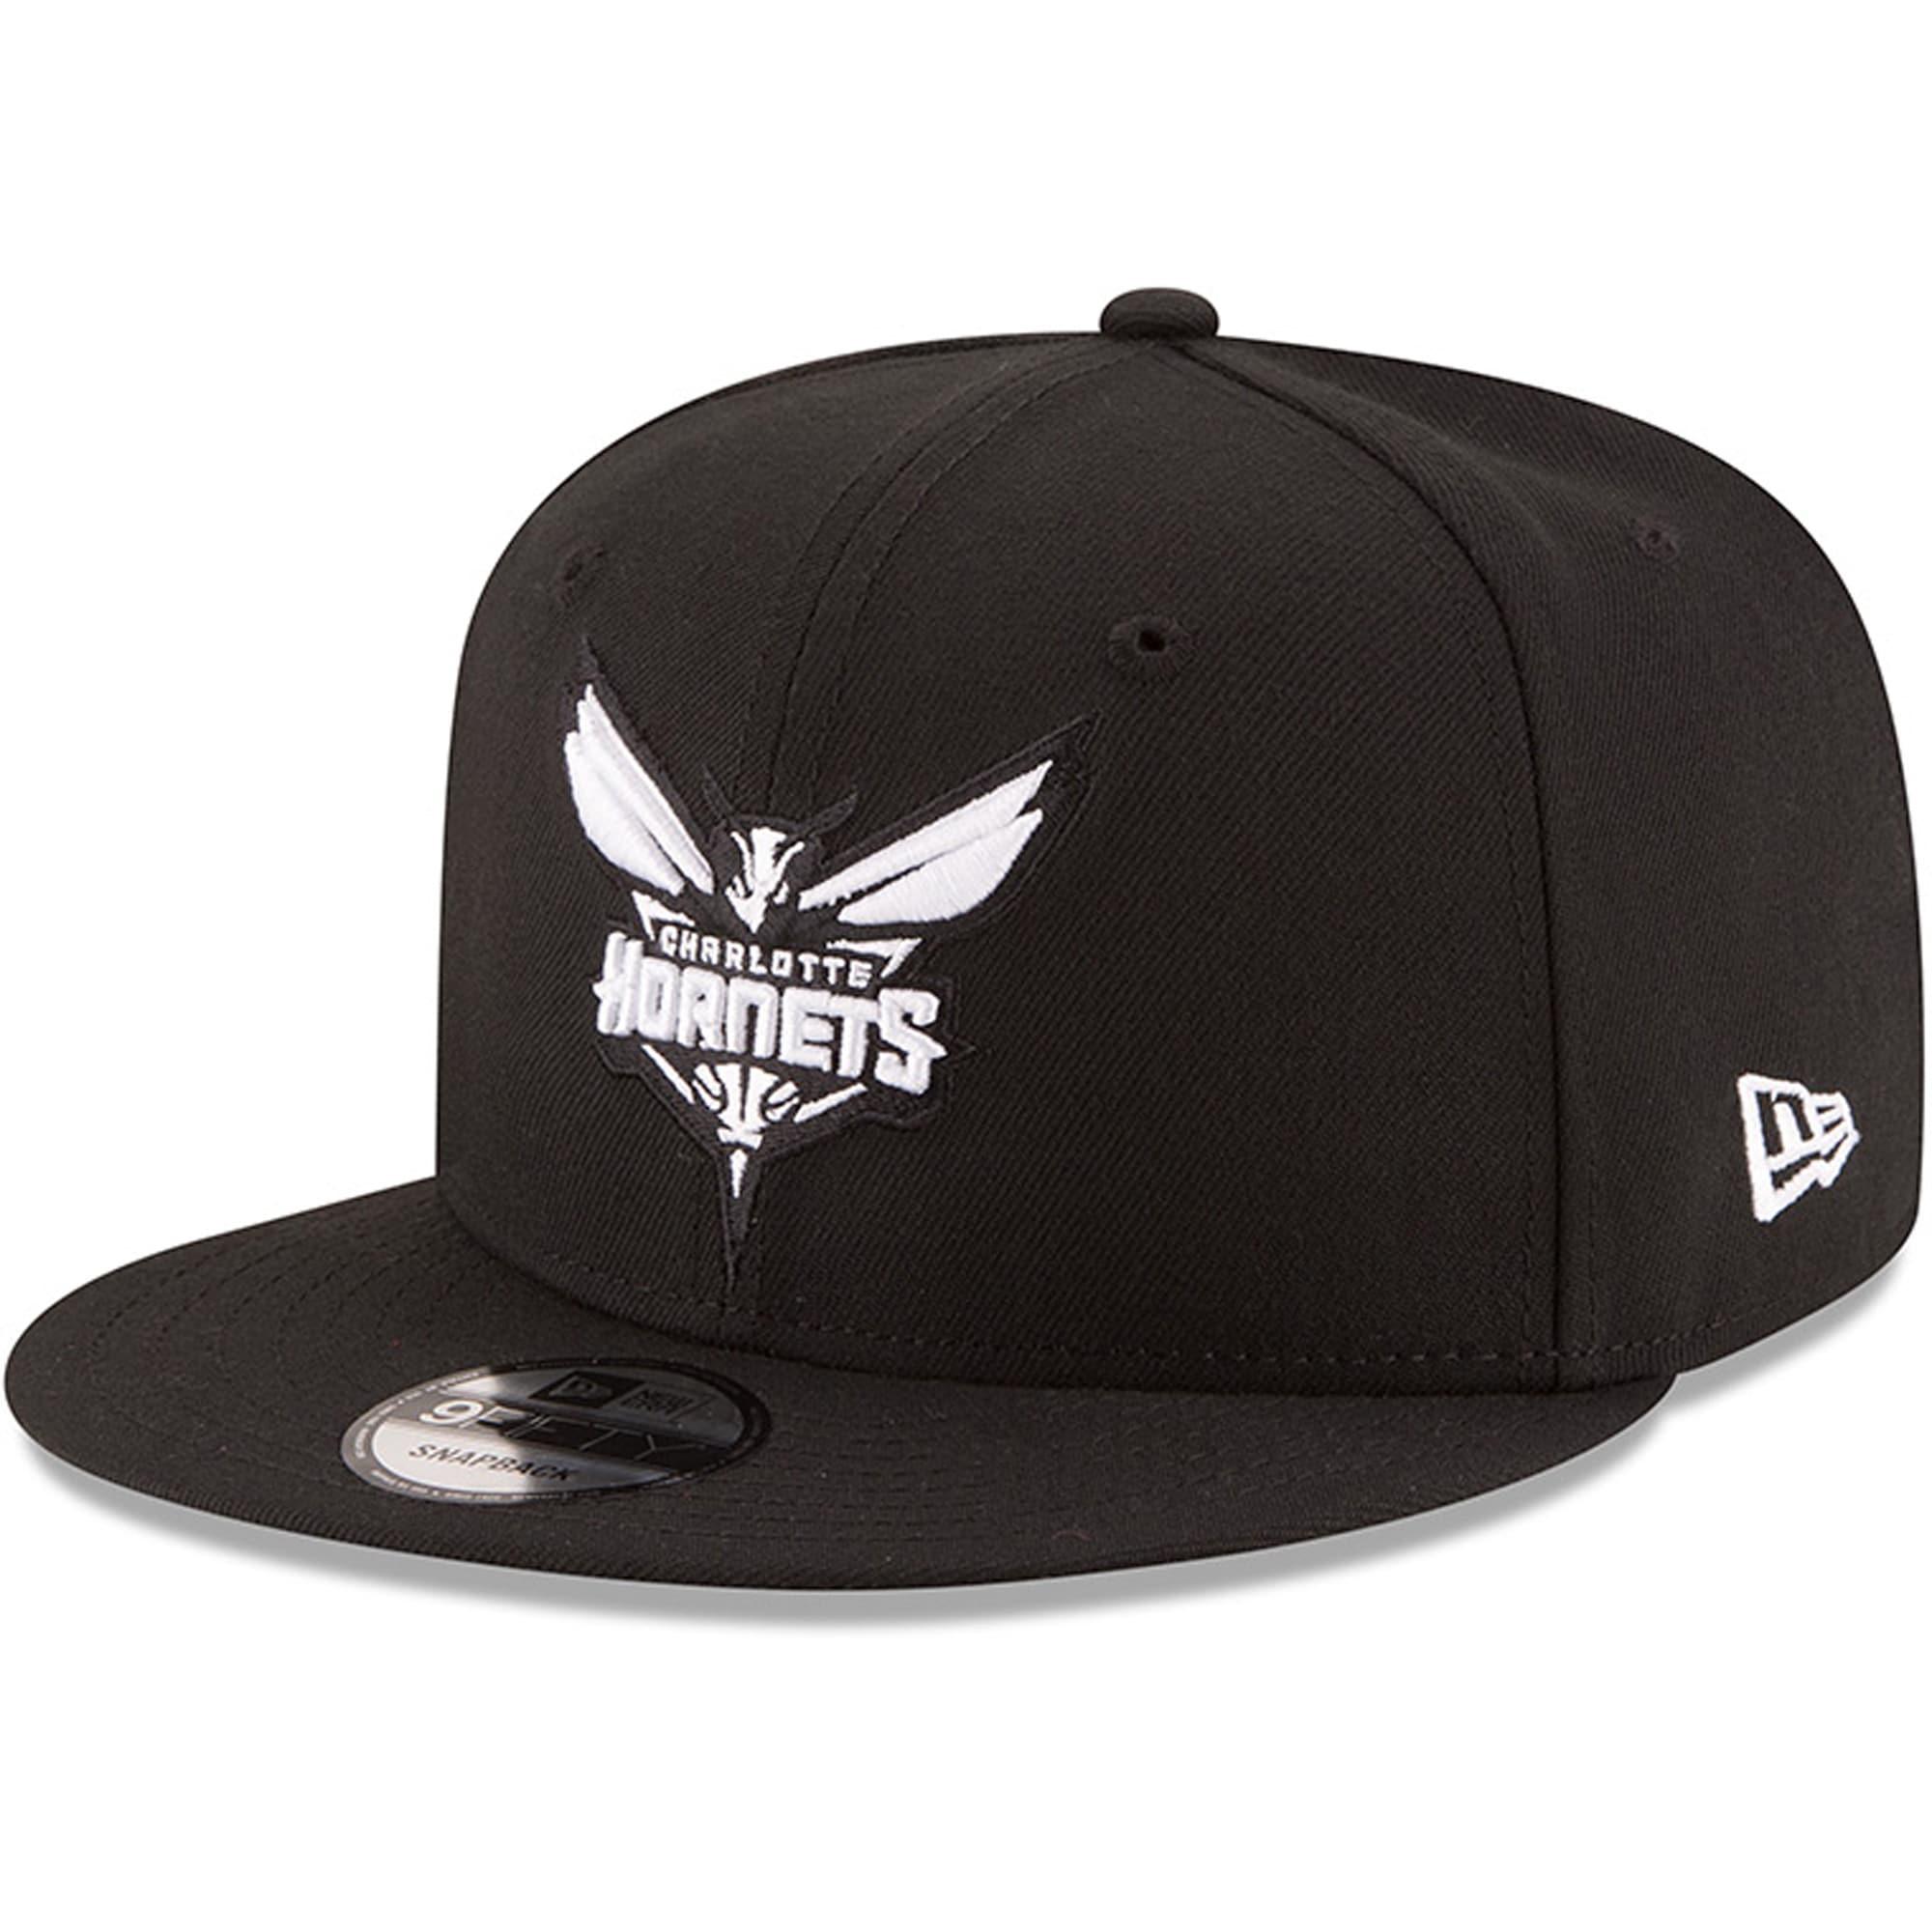 Charlotte Hornets New Era Black & White Logo 9FIFTY Adjustable Snapback Hat - Black